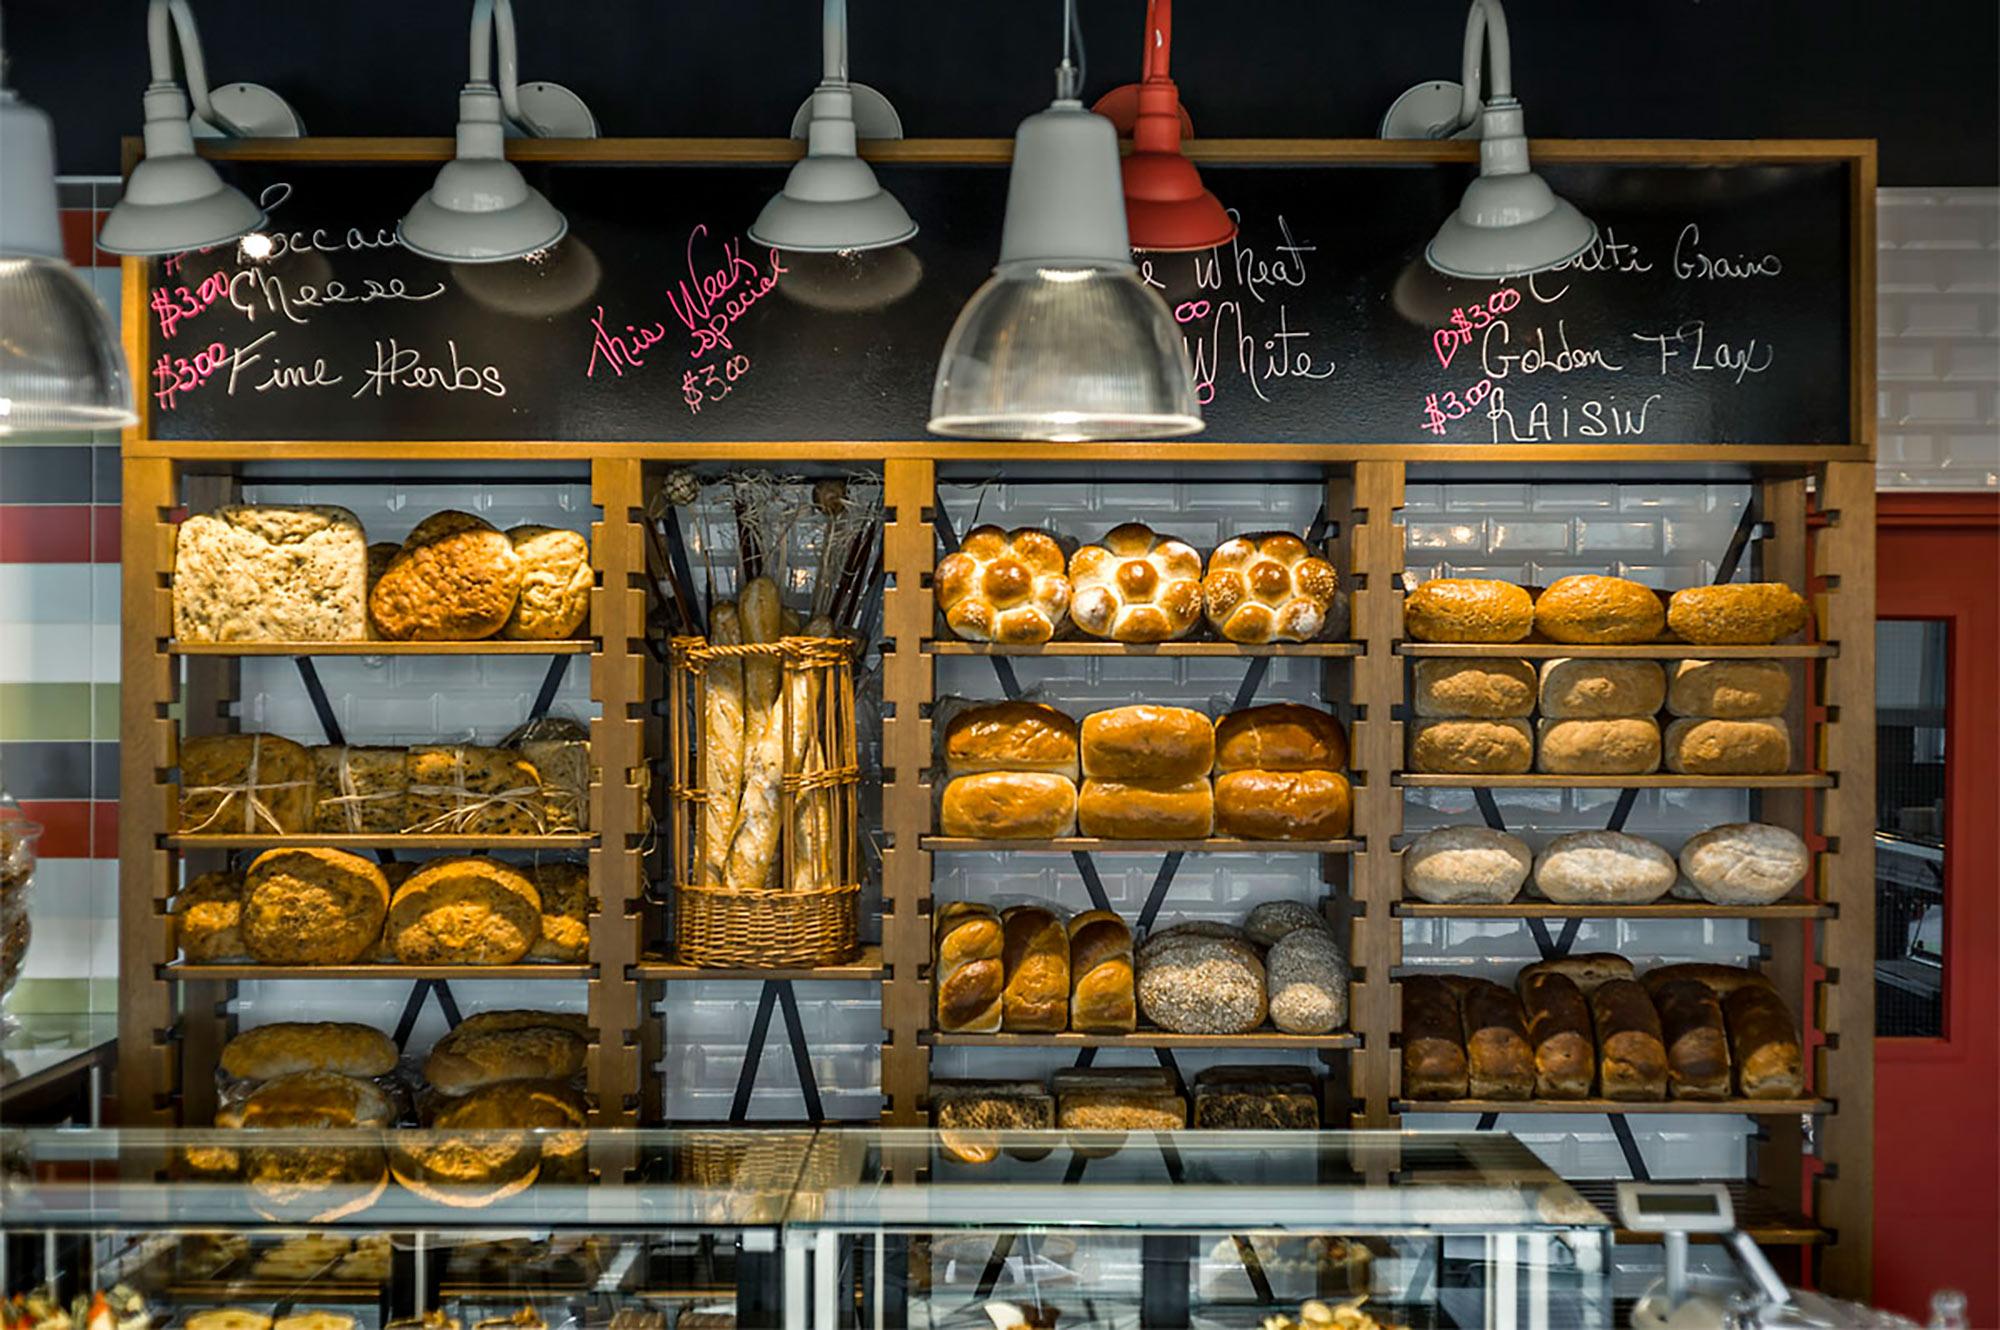 interior-design-cafe-bread-display-shelves.jpg